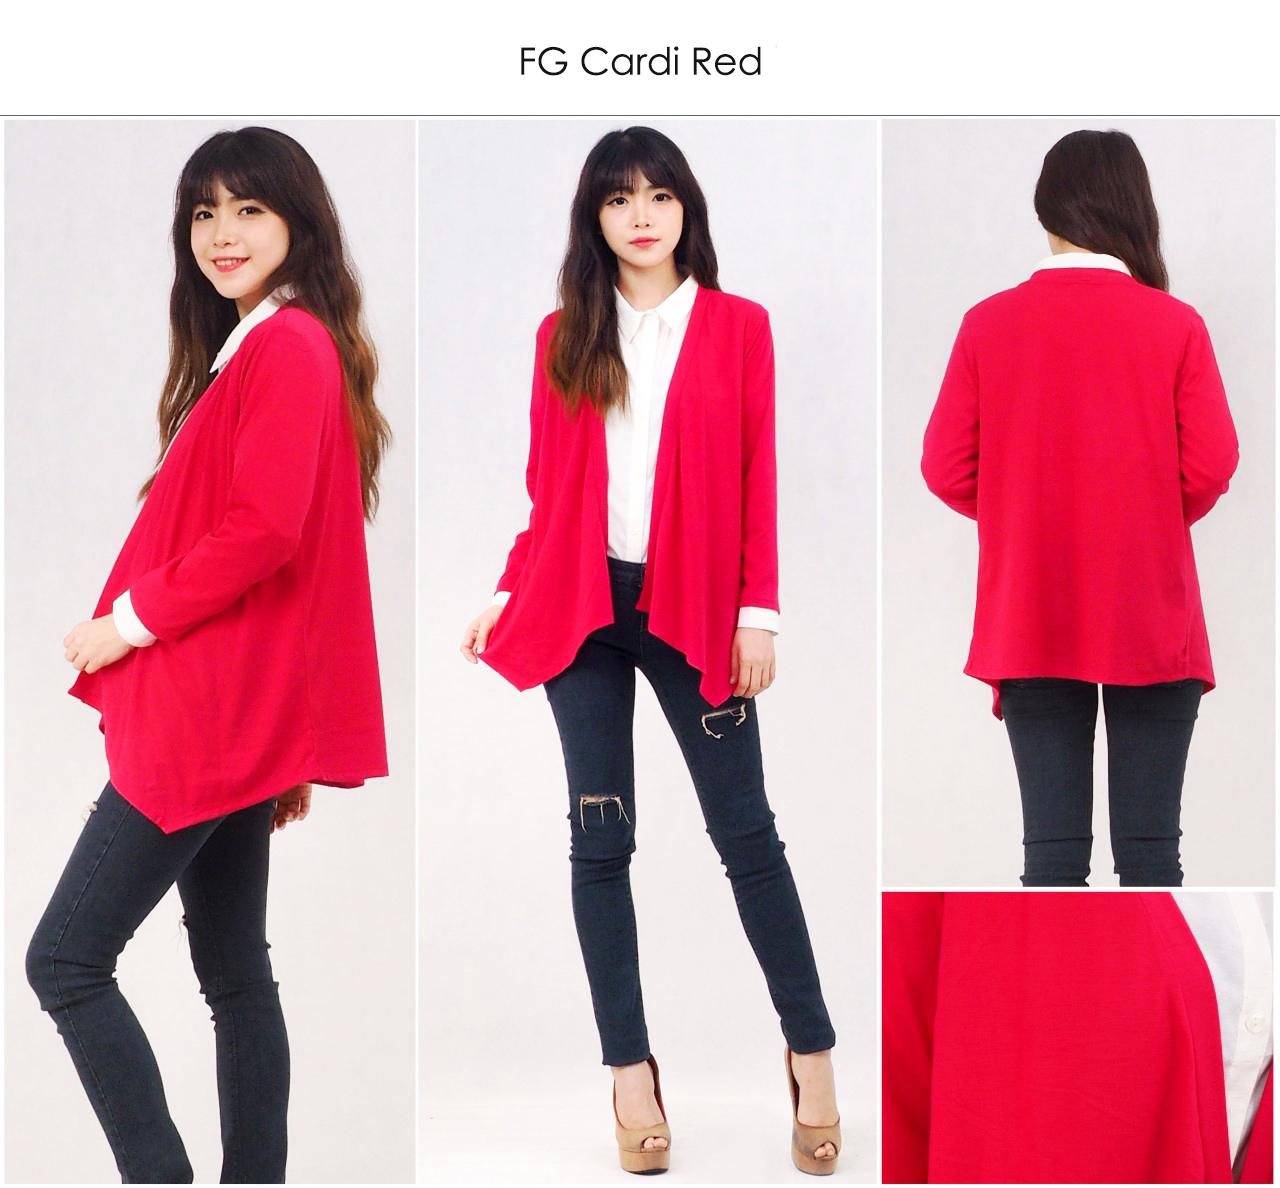 Jual Red Branded Cardigan Merah S M Cardy Baju Outer Wanita Polos Flash  Blazer Denim Pakaian Navy L Martob Organizer Tokopedia